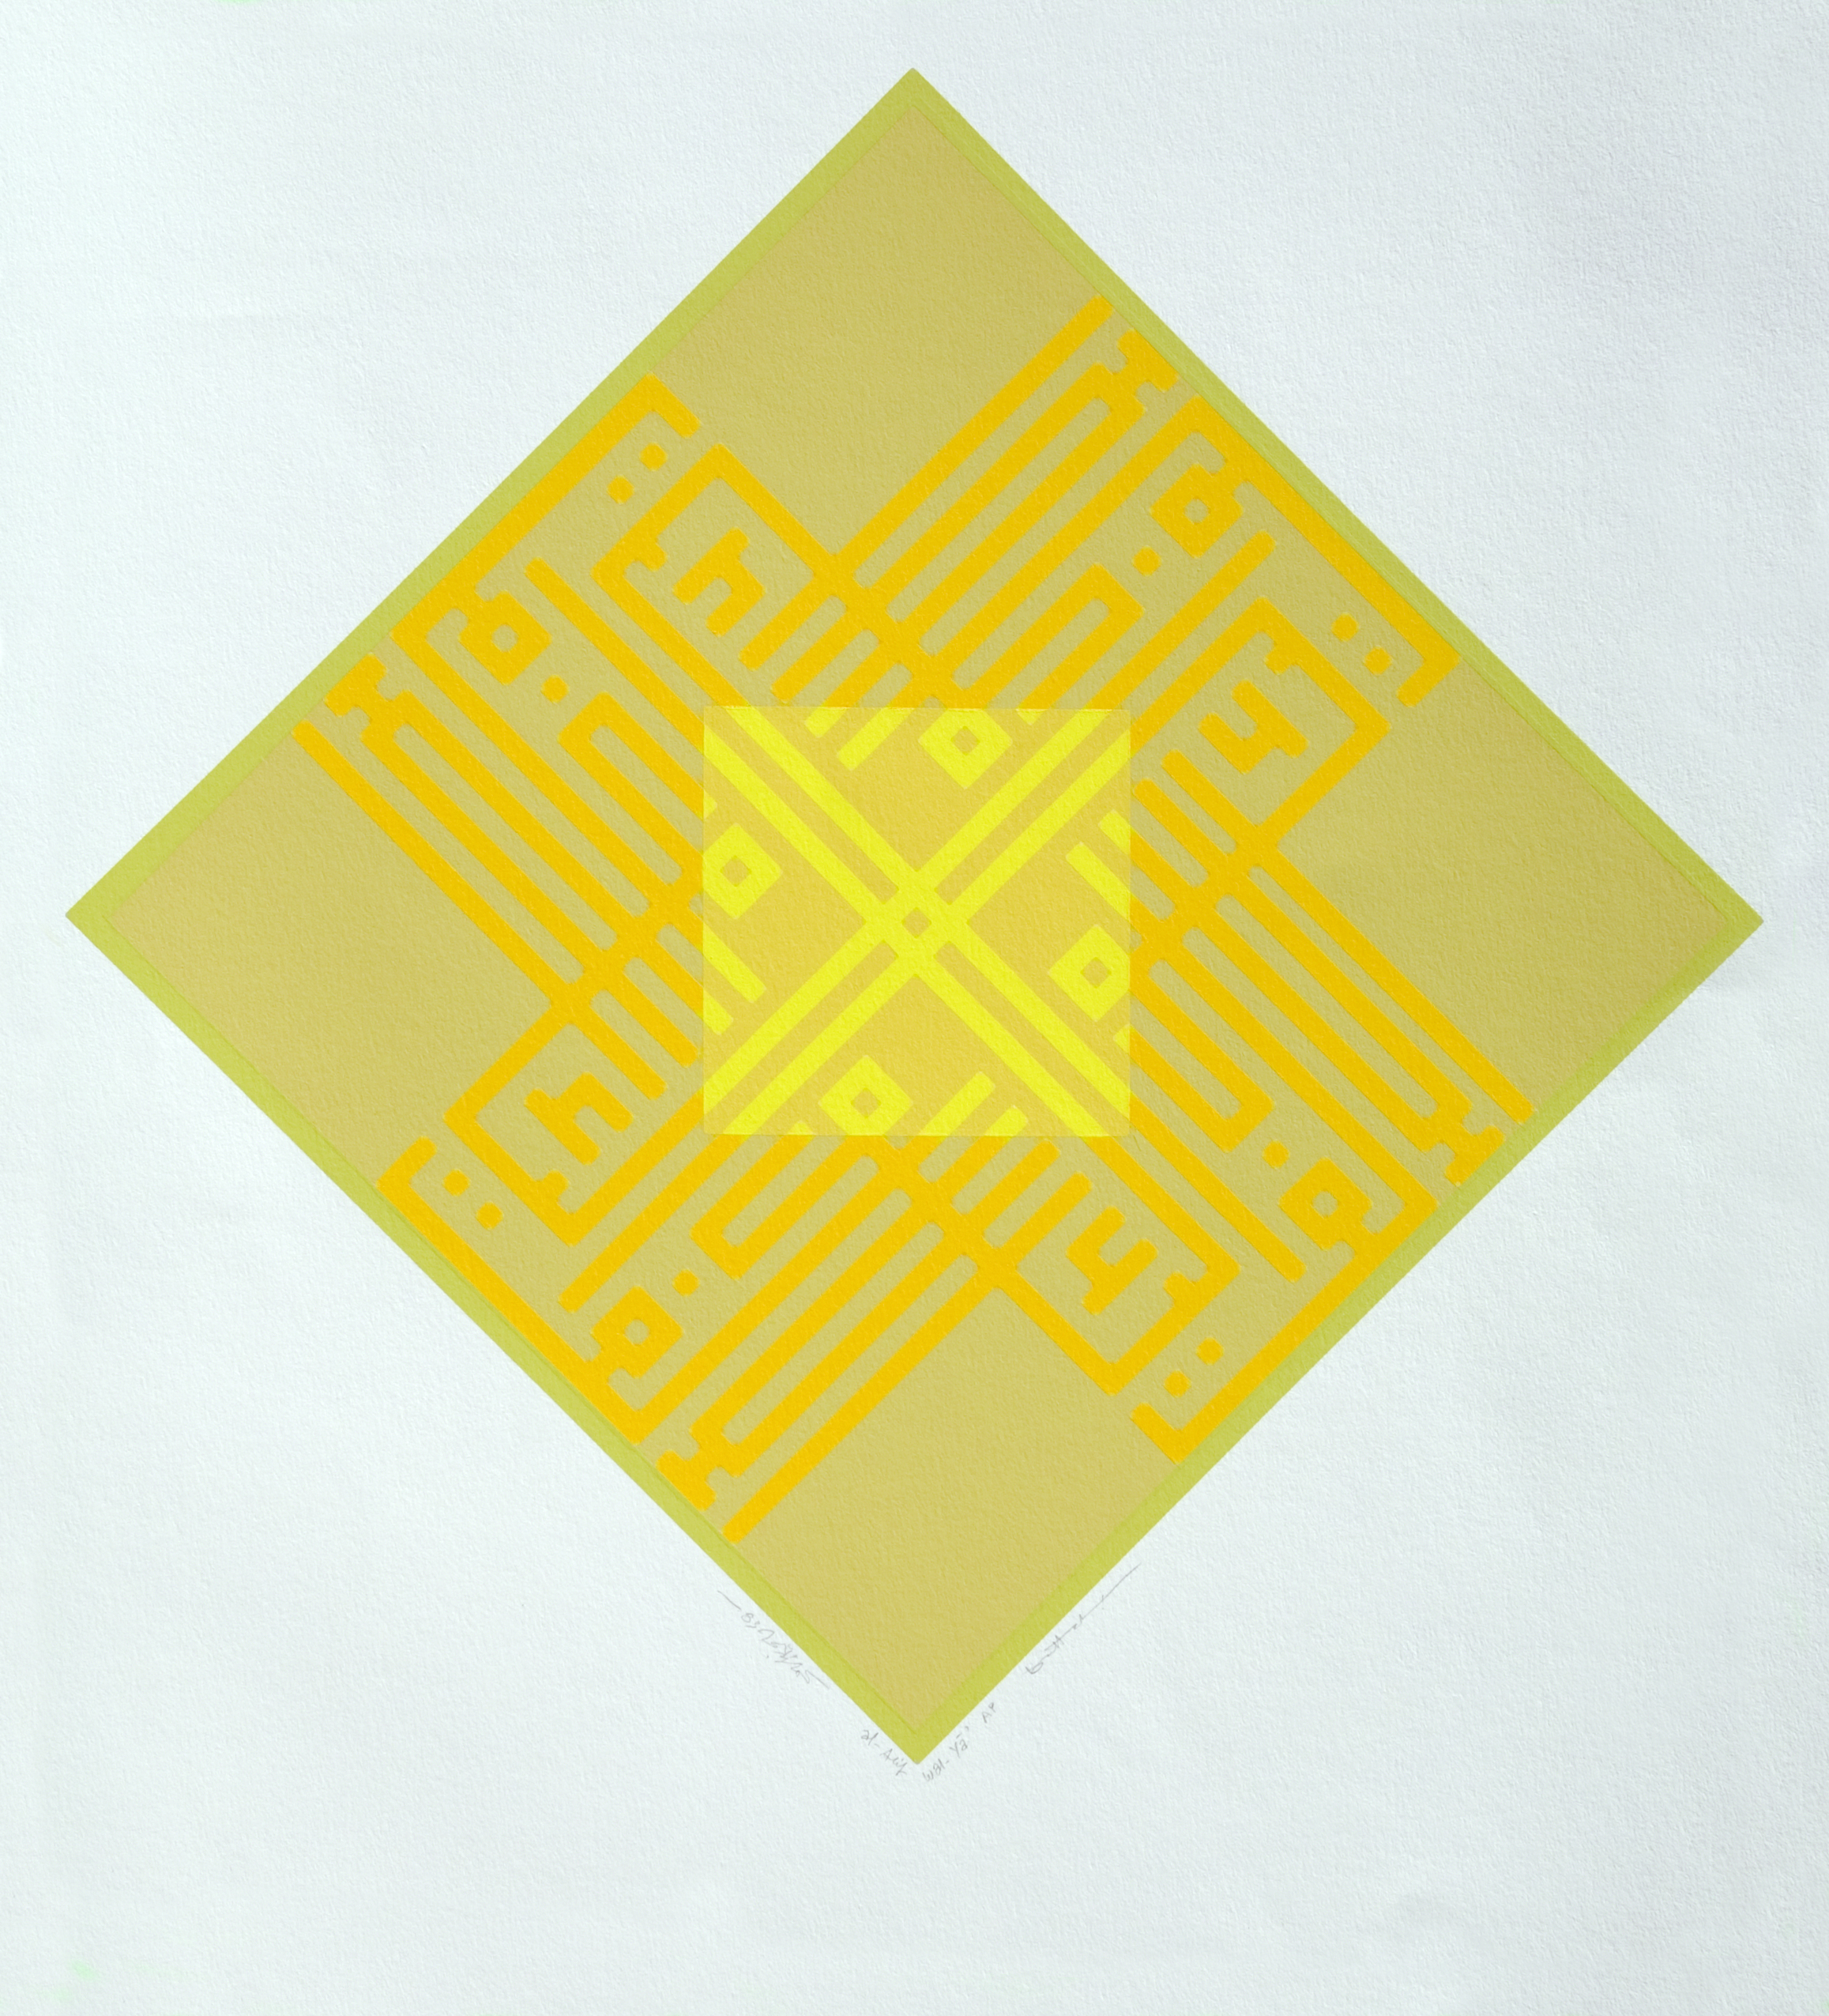 Kamal Boullata, Al-Alif wa-l-Ya, 1983, Silkscreen, 52 × 52 cm. Image courtesy of Barjeel Art Foundation, Sharjah.